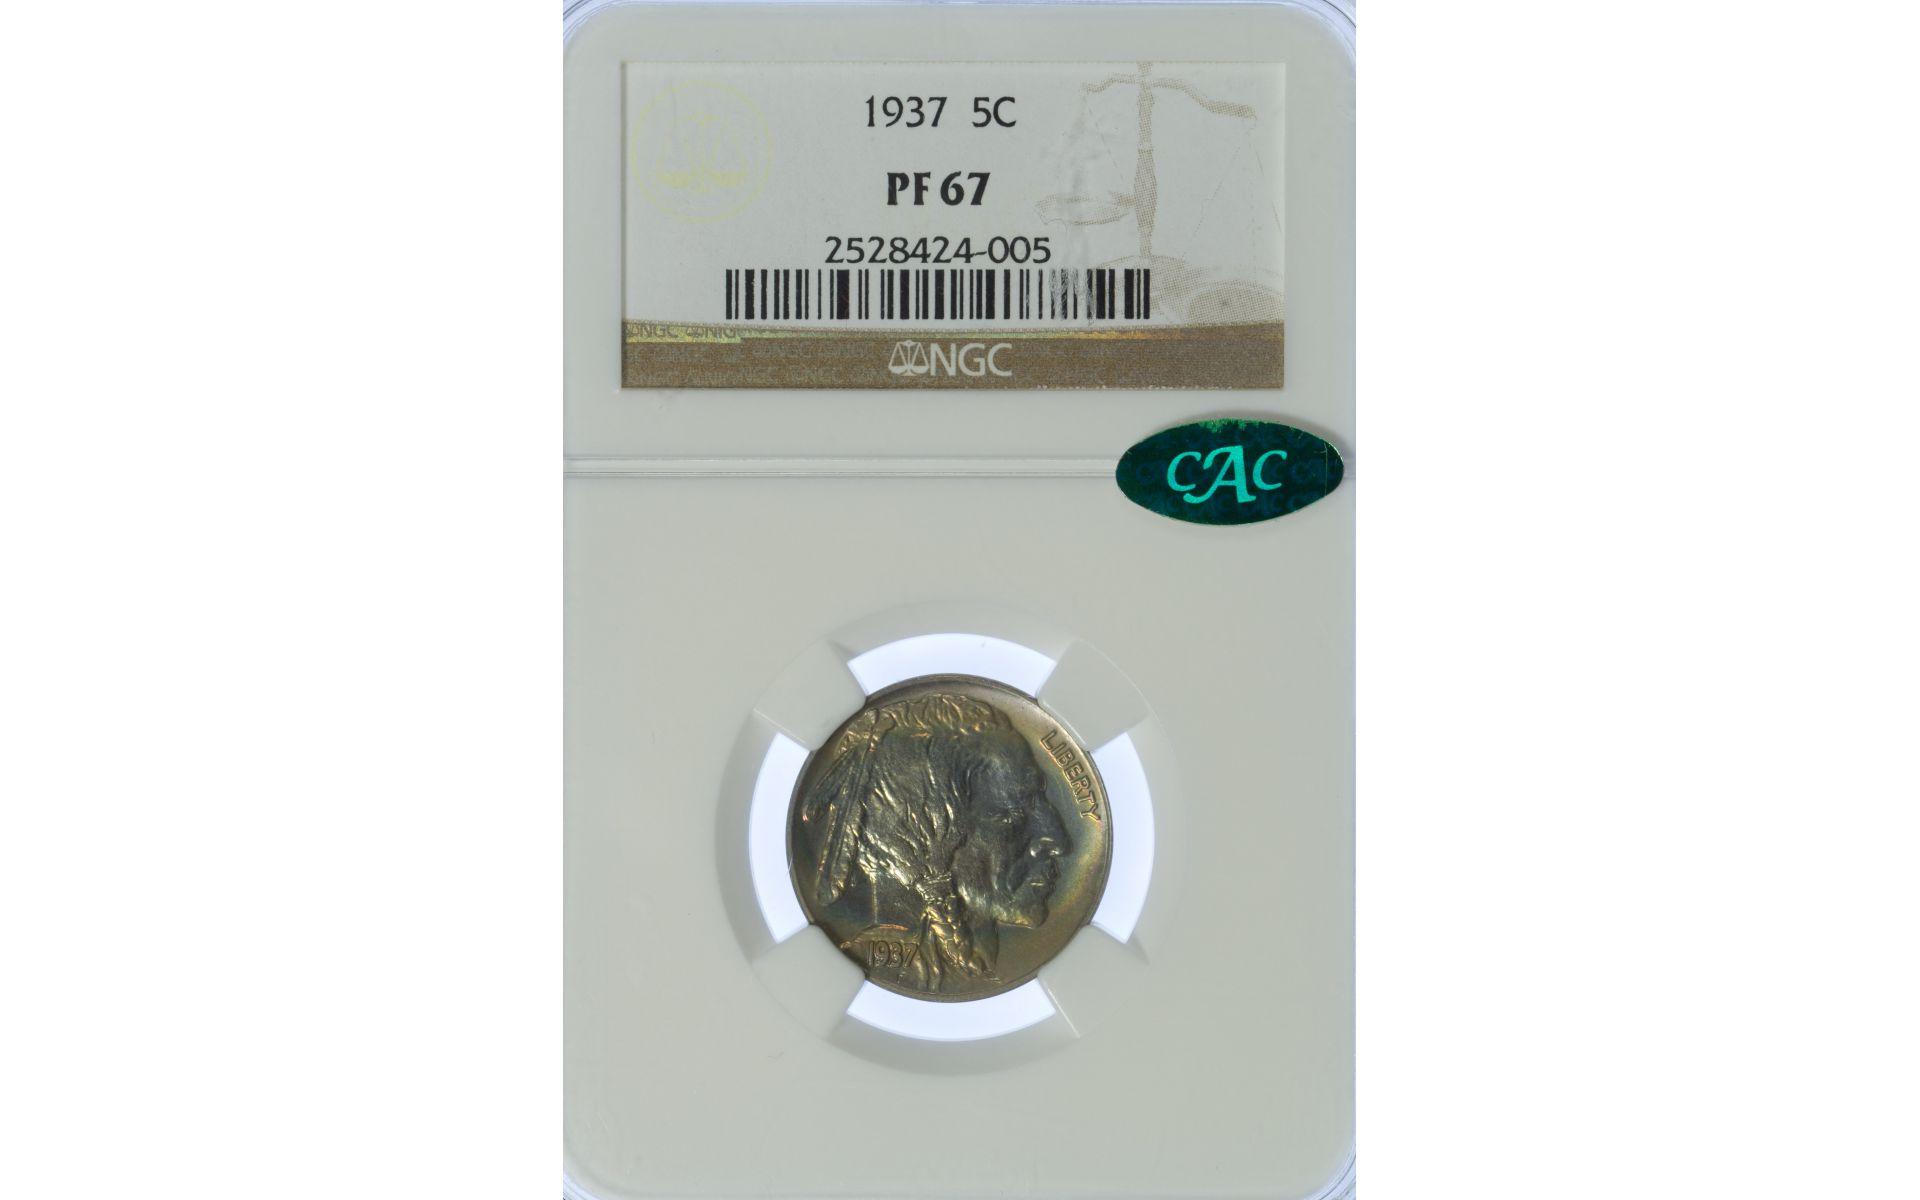 Coin & Currency Auction Catalog #133   Leonard Auction